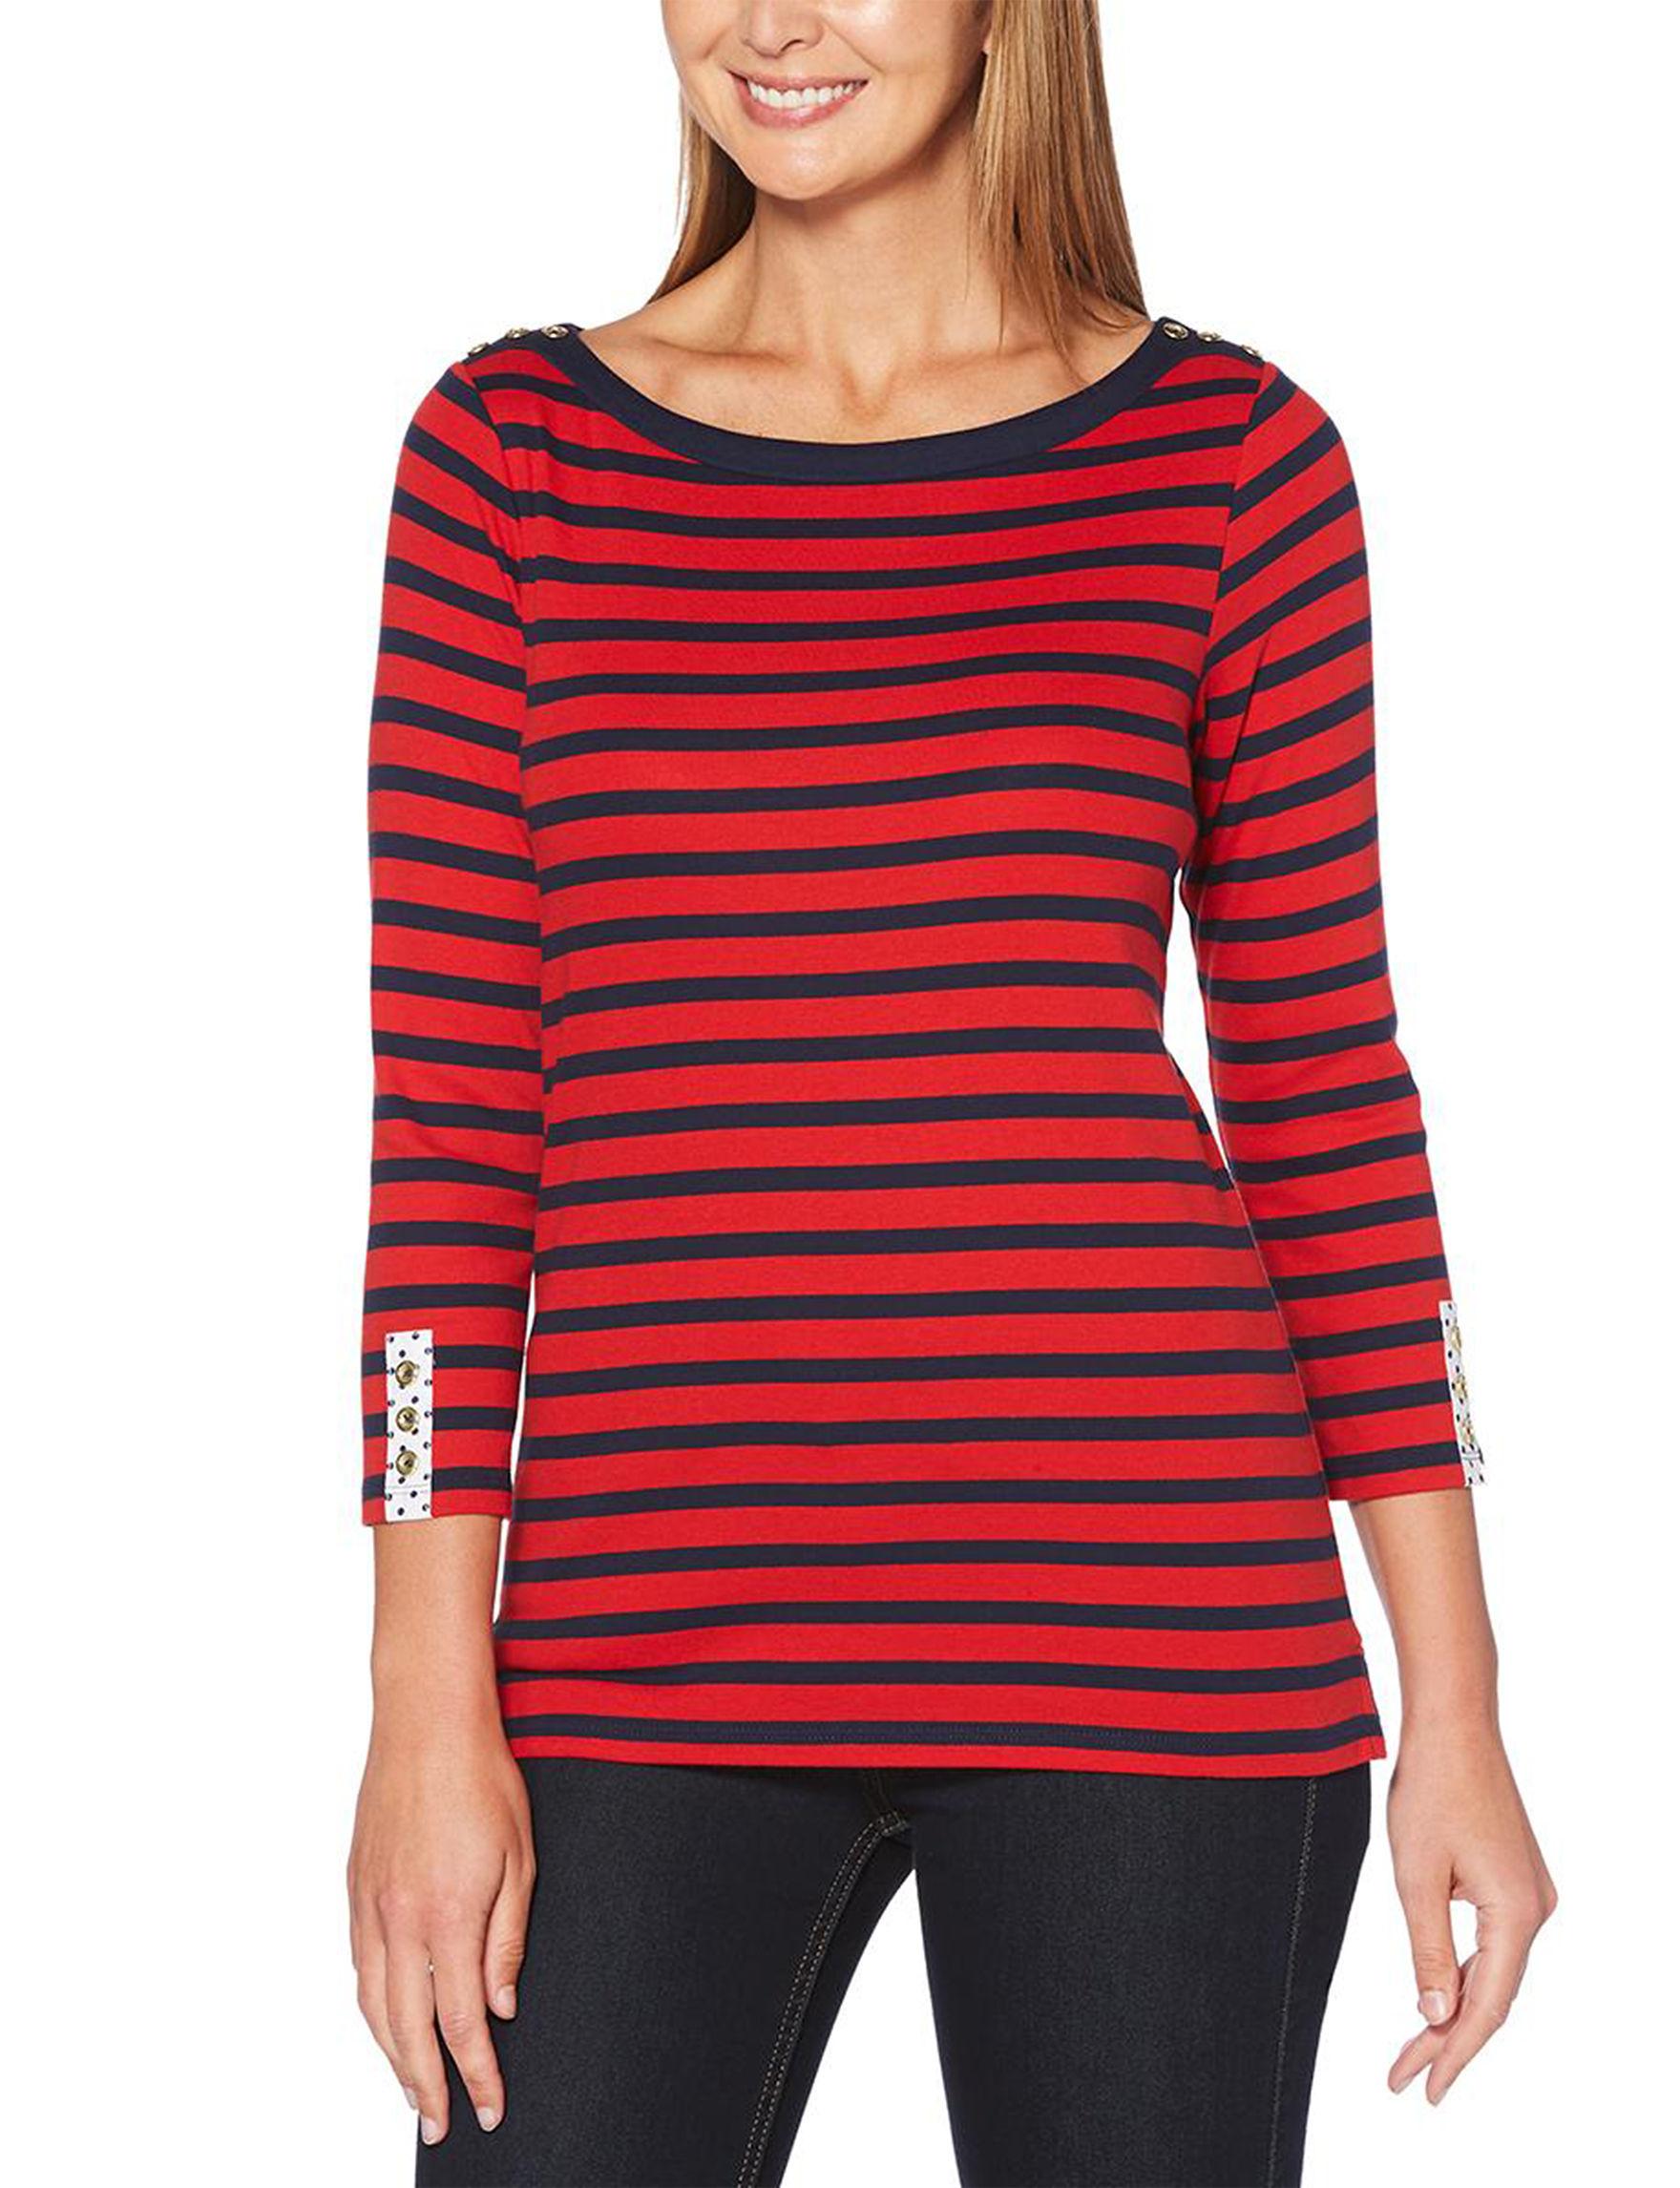 Rafaella Red / Black Shirts & Blouses